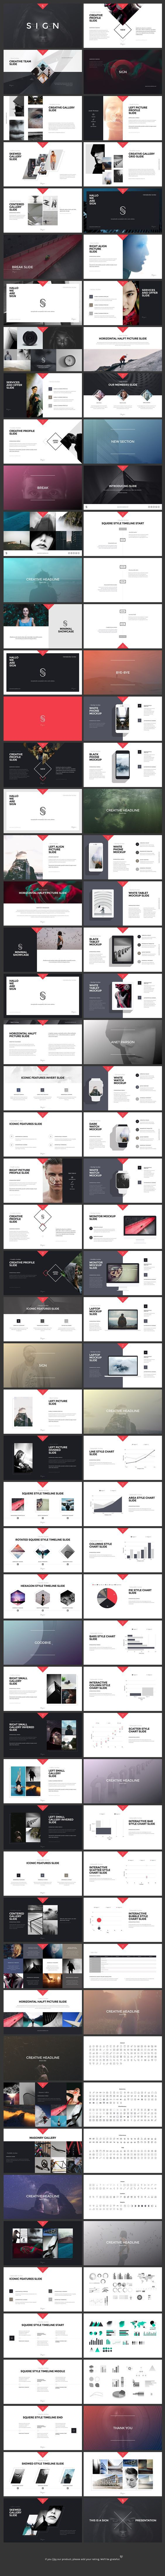 SIGN template contains more than 100+ unique slides. Original design & powerful features.